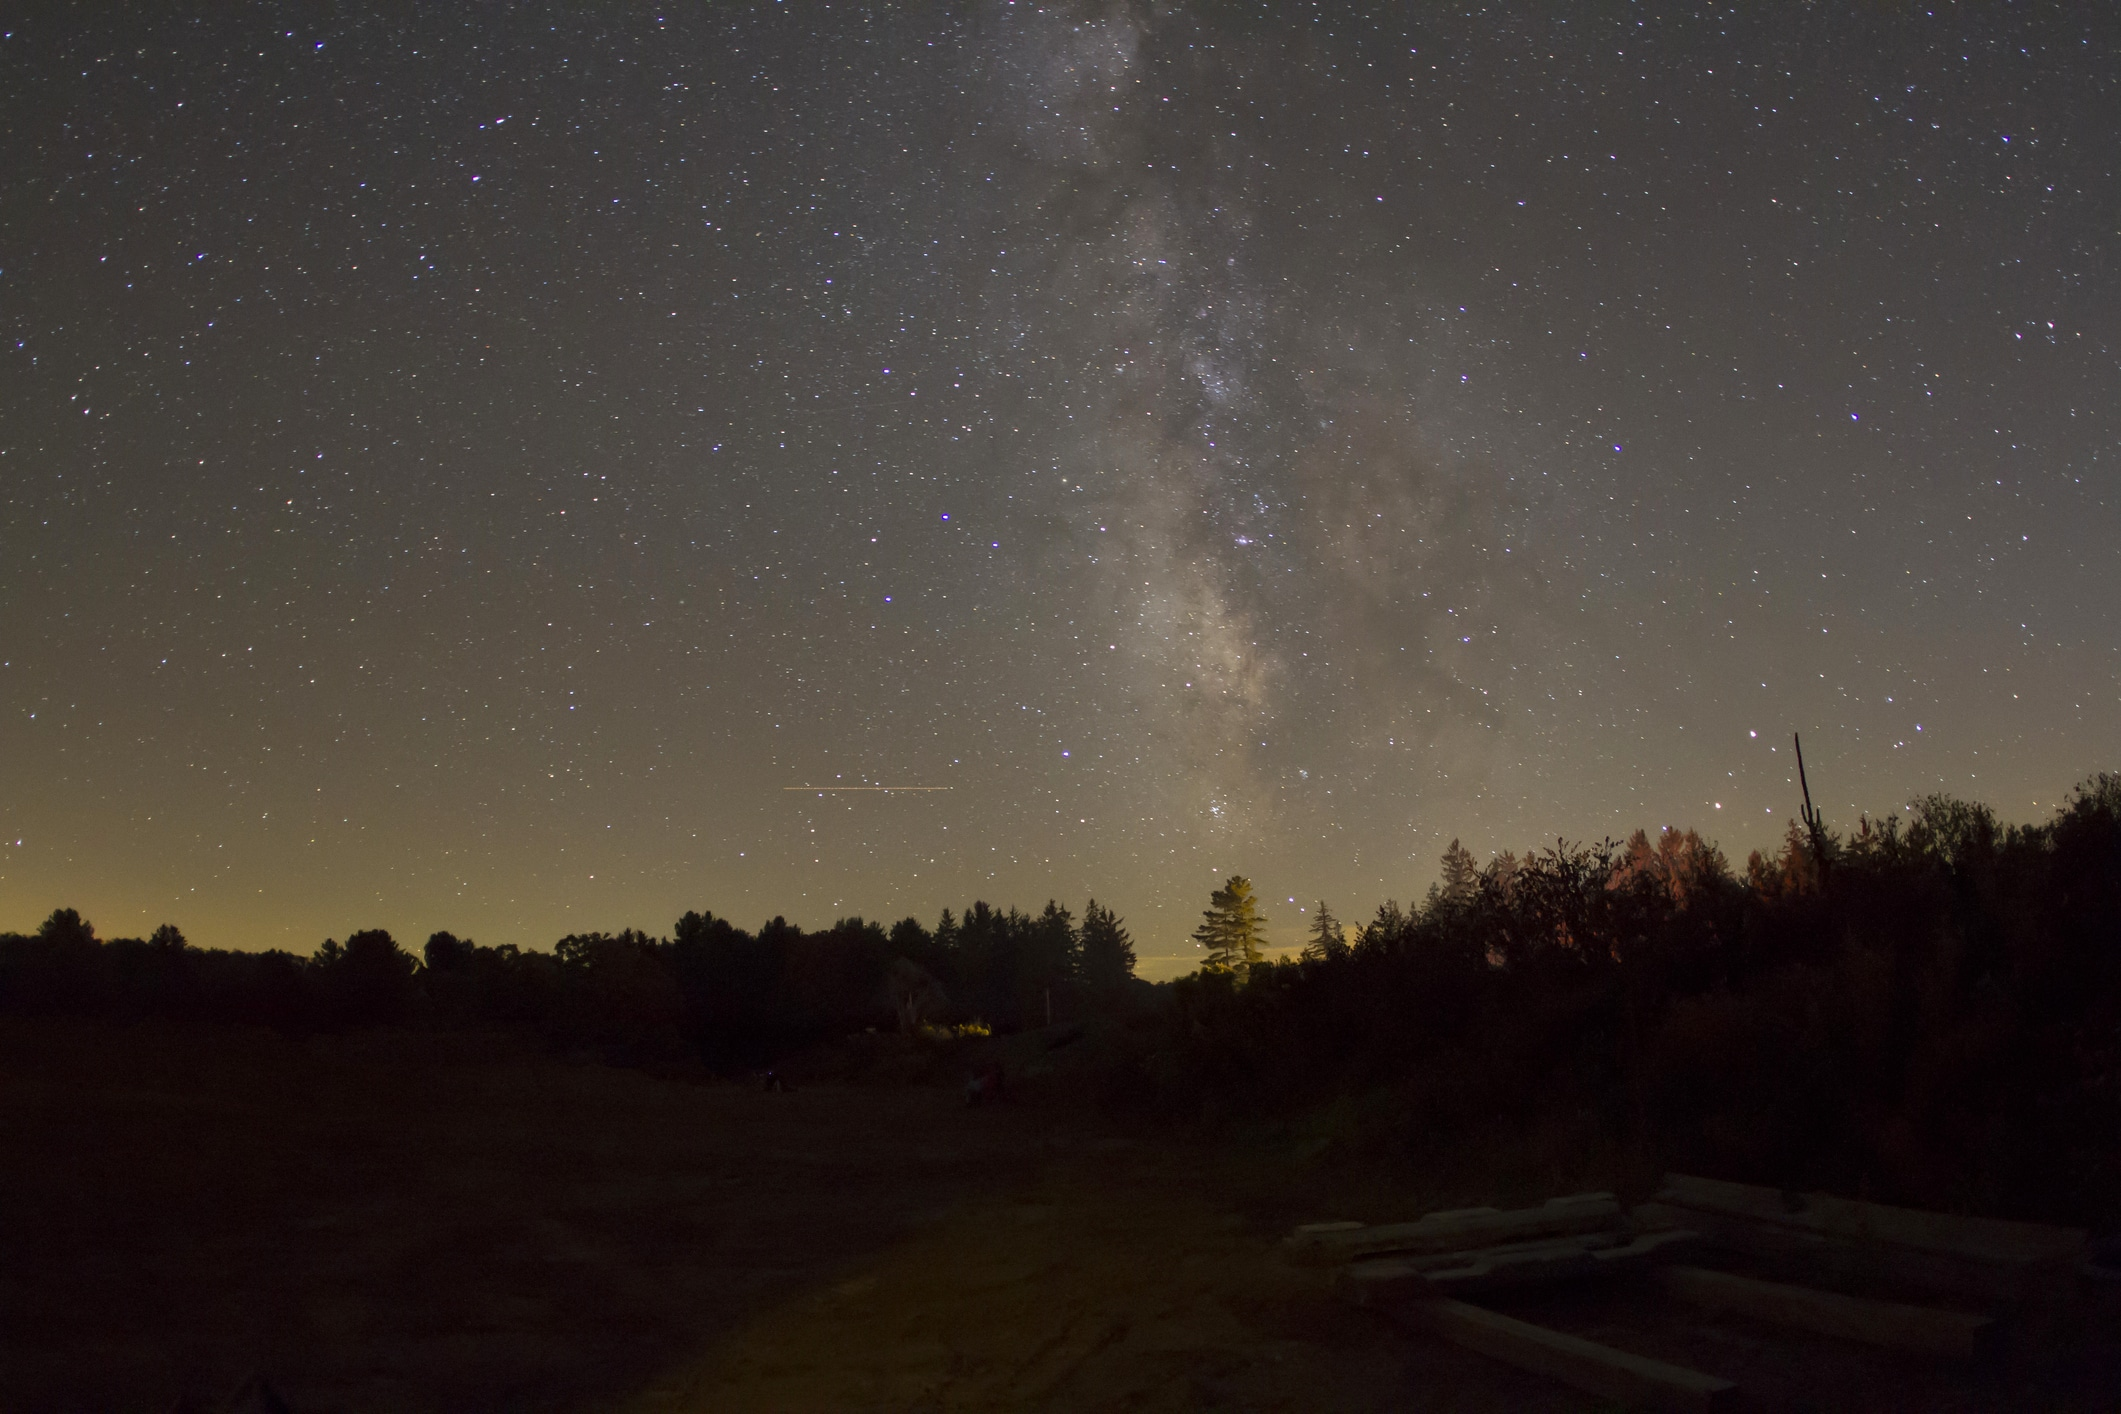 Stars rise like a pillar on the horizon.